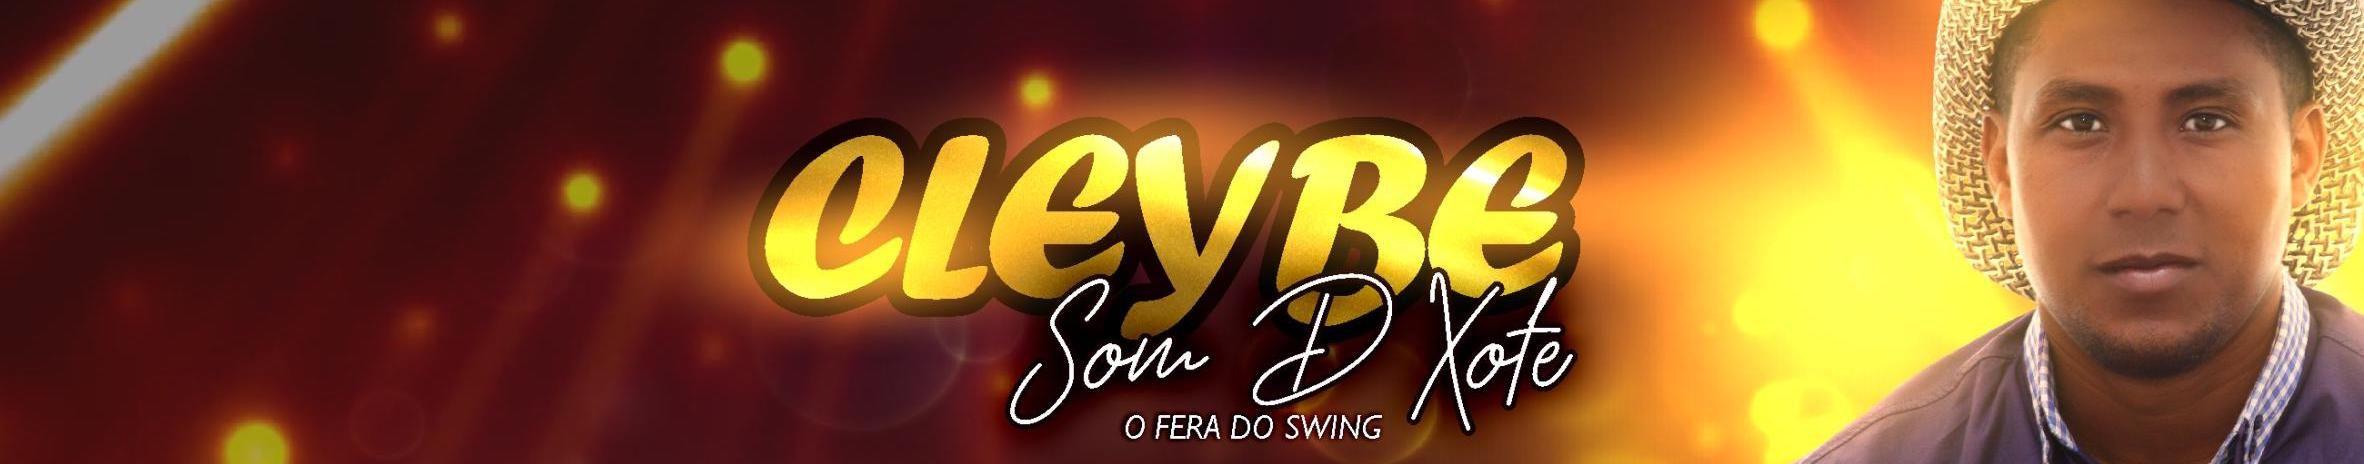 Imagem de capa de Cleybe som D Xote